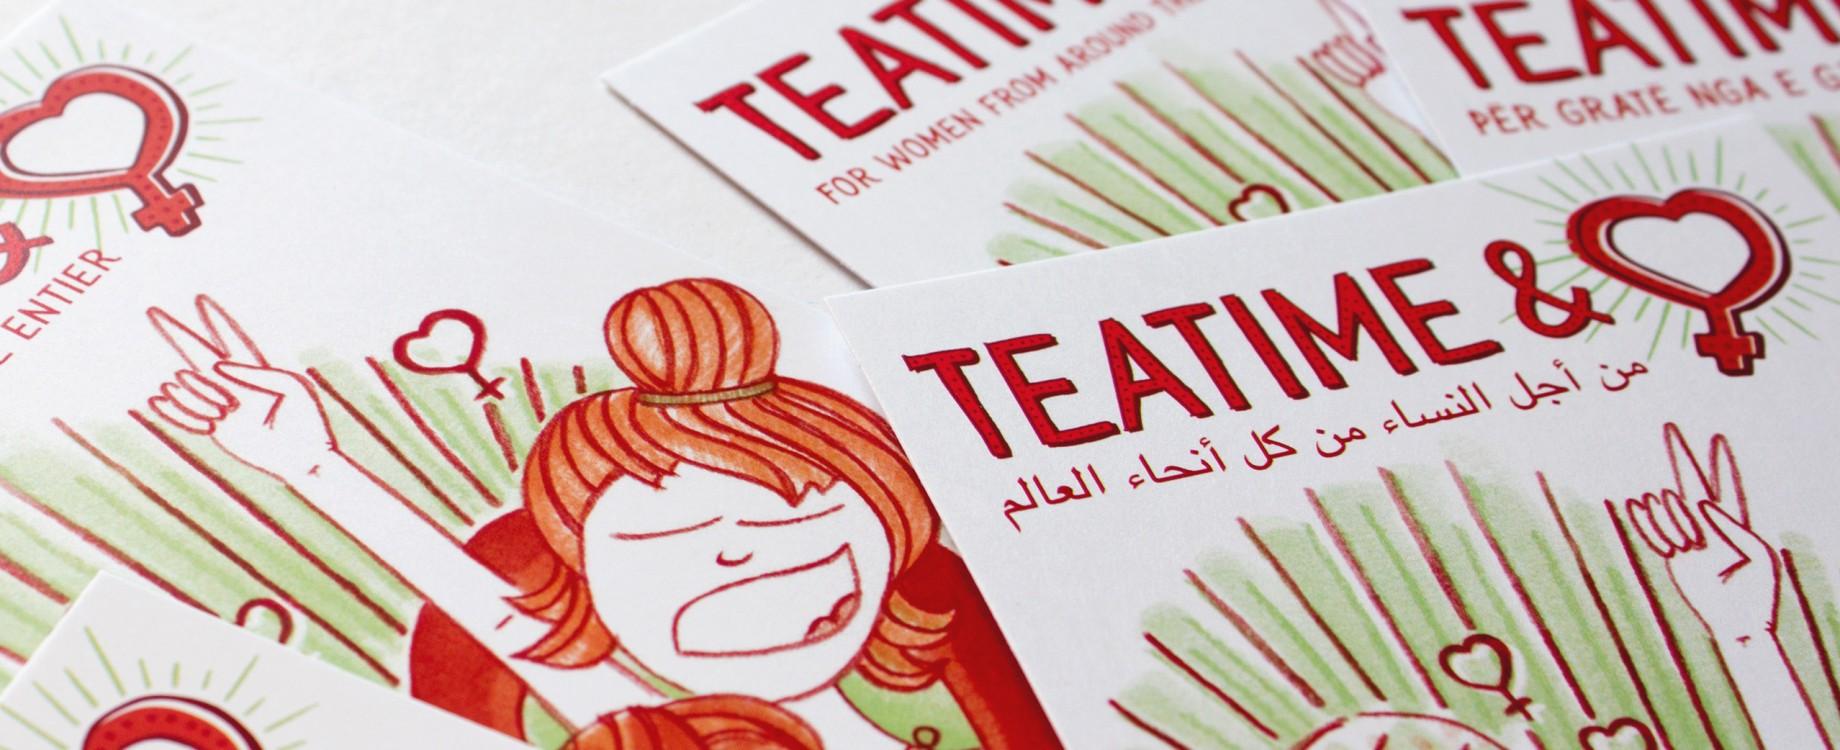 Teatime & Heart